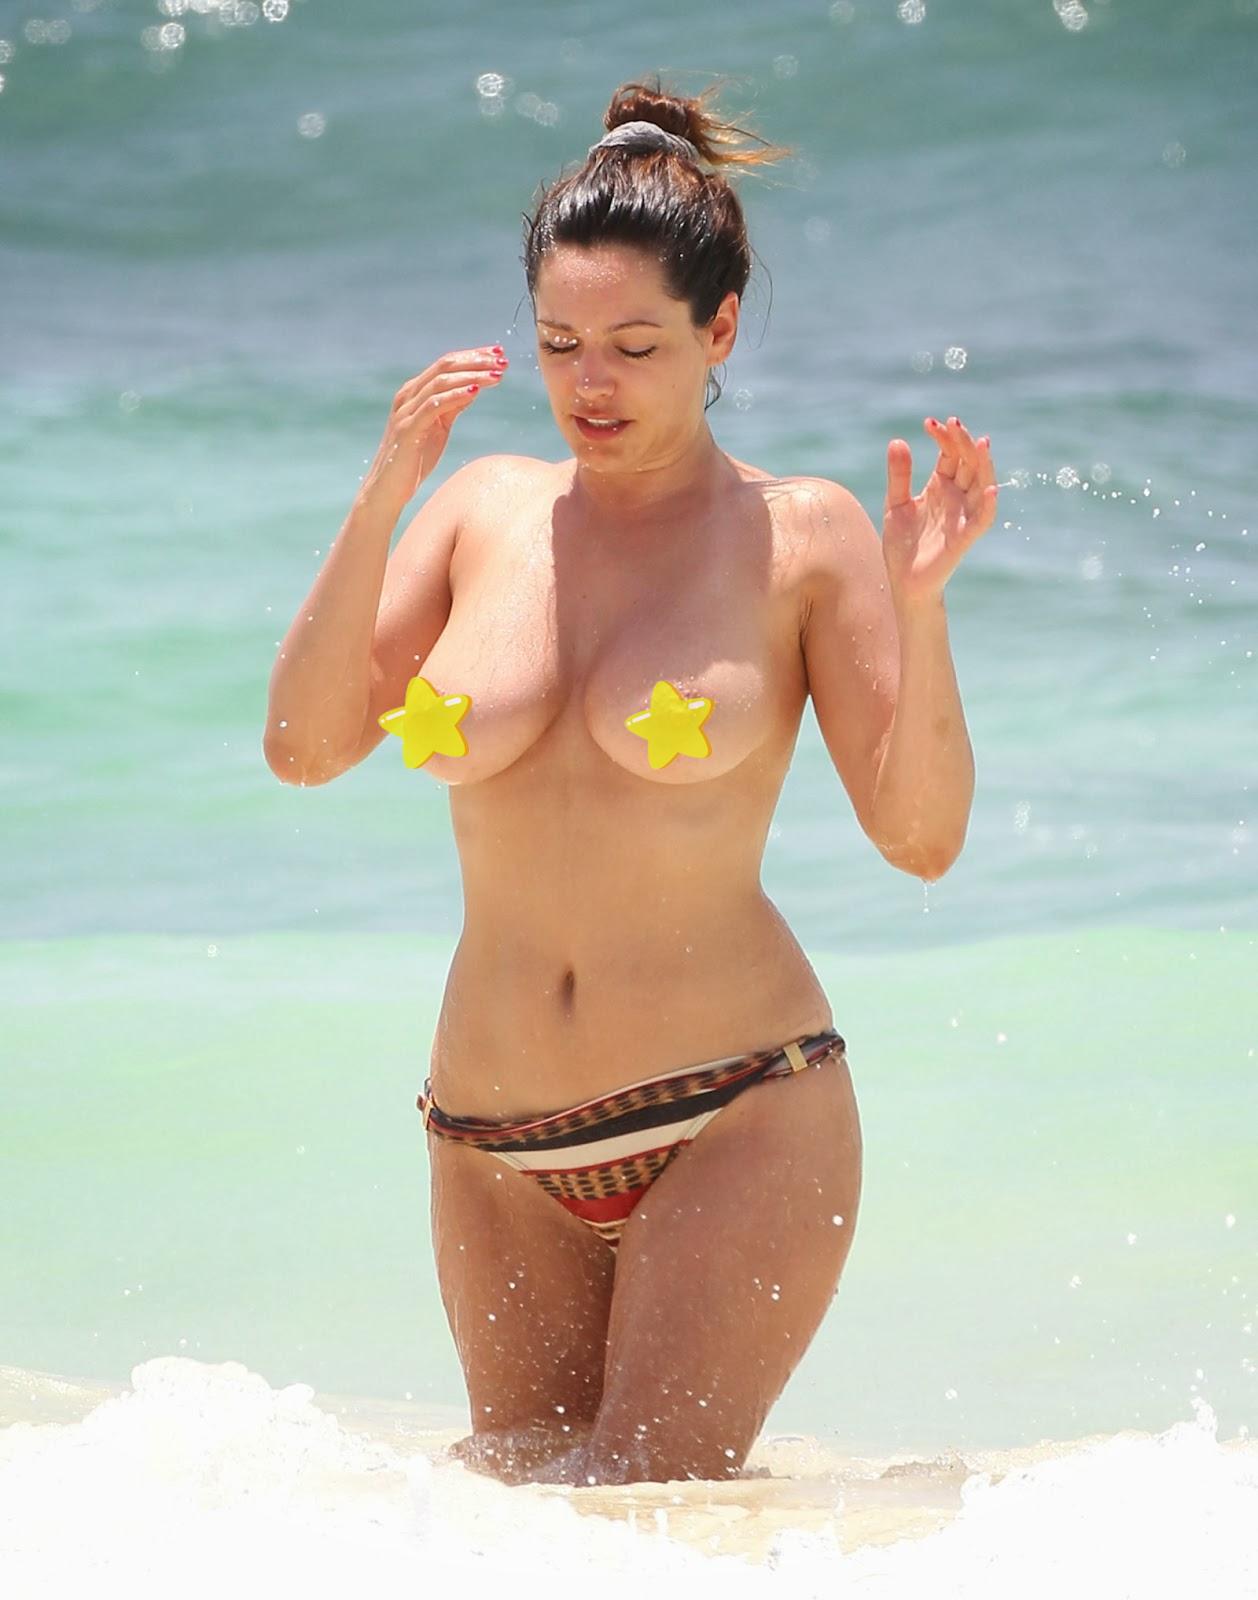 Naked celebrity in beach